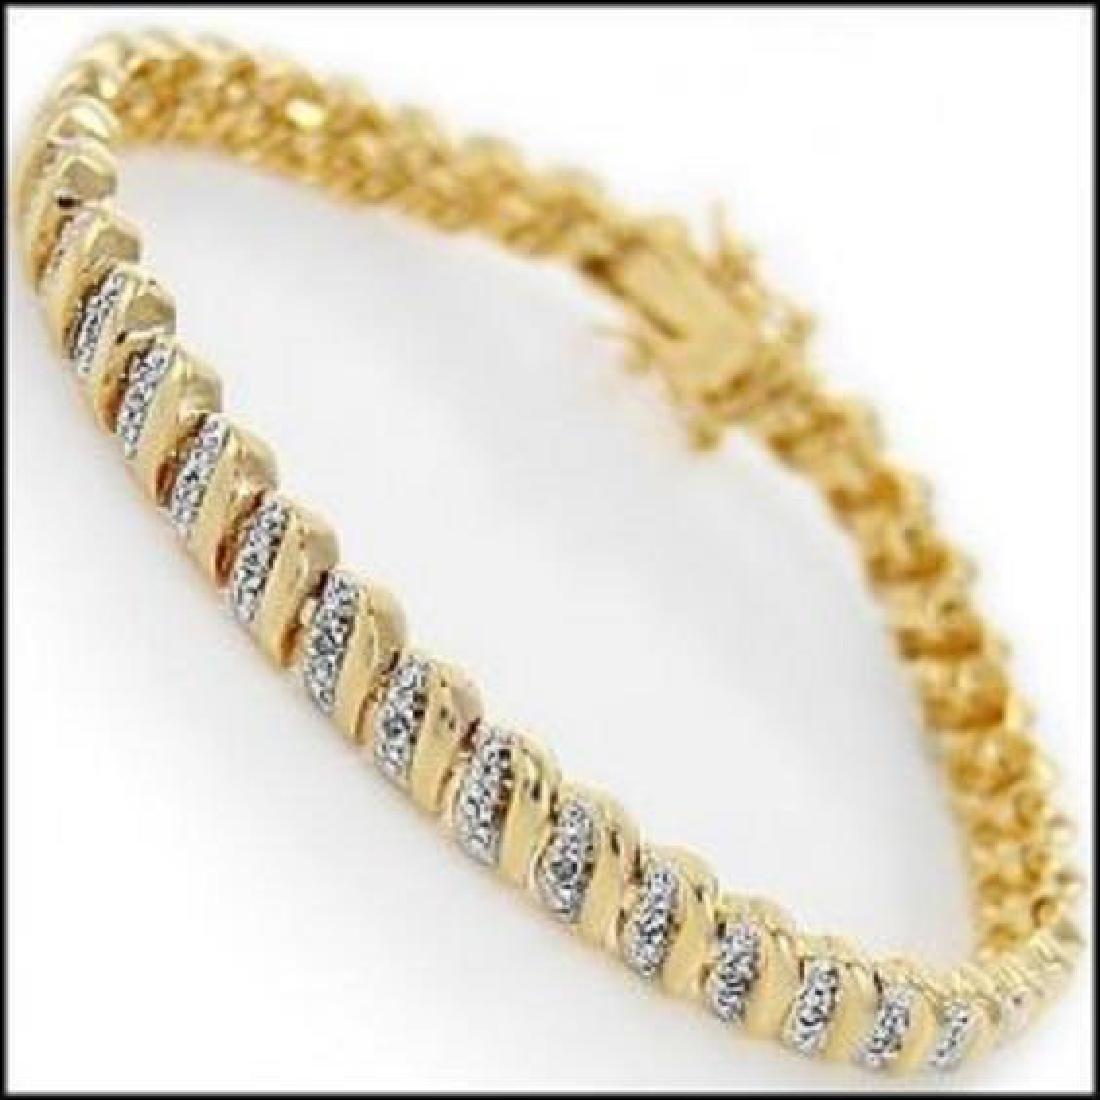 1.75 CTW Diamond Tennis Bracelet